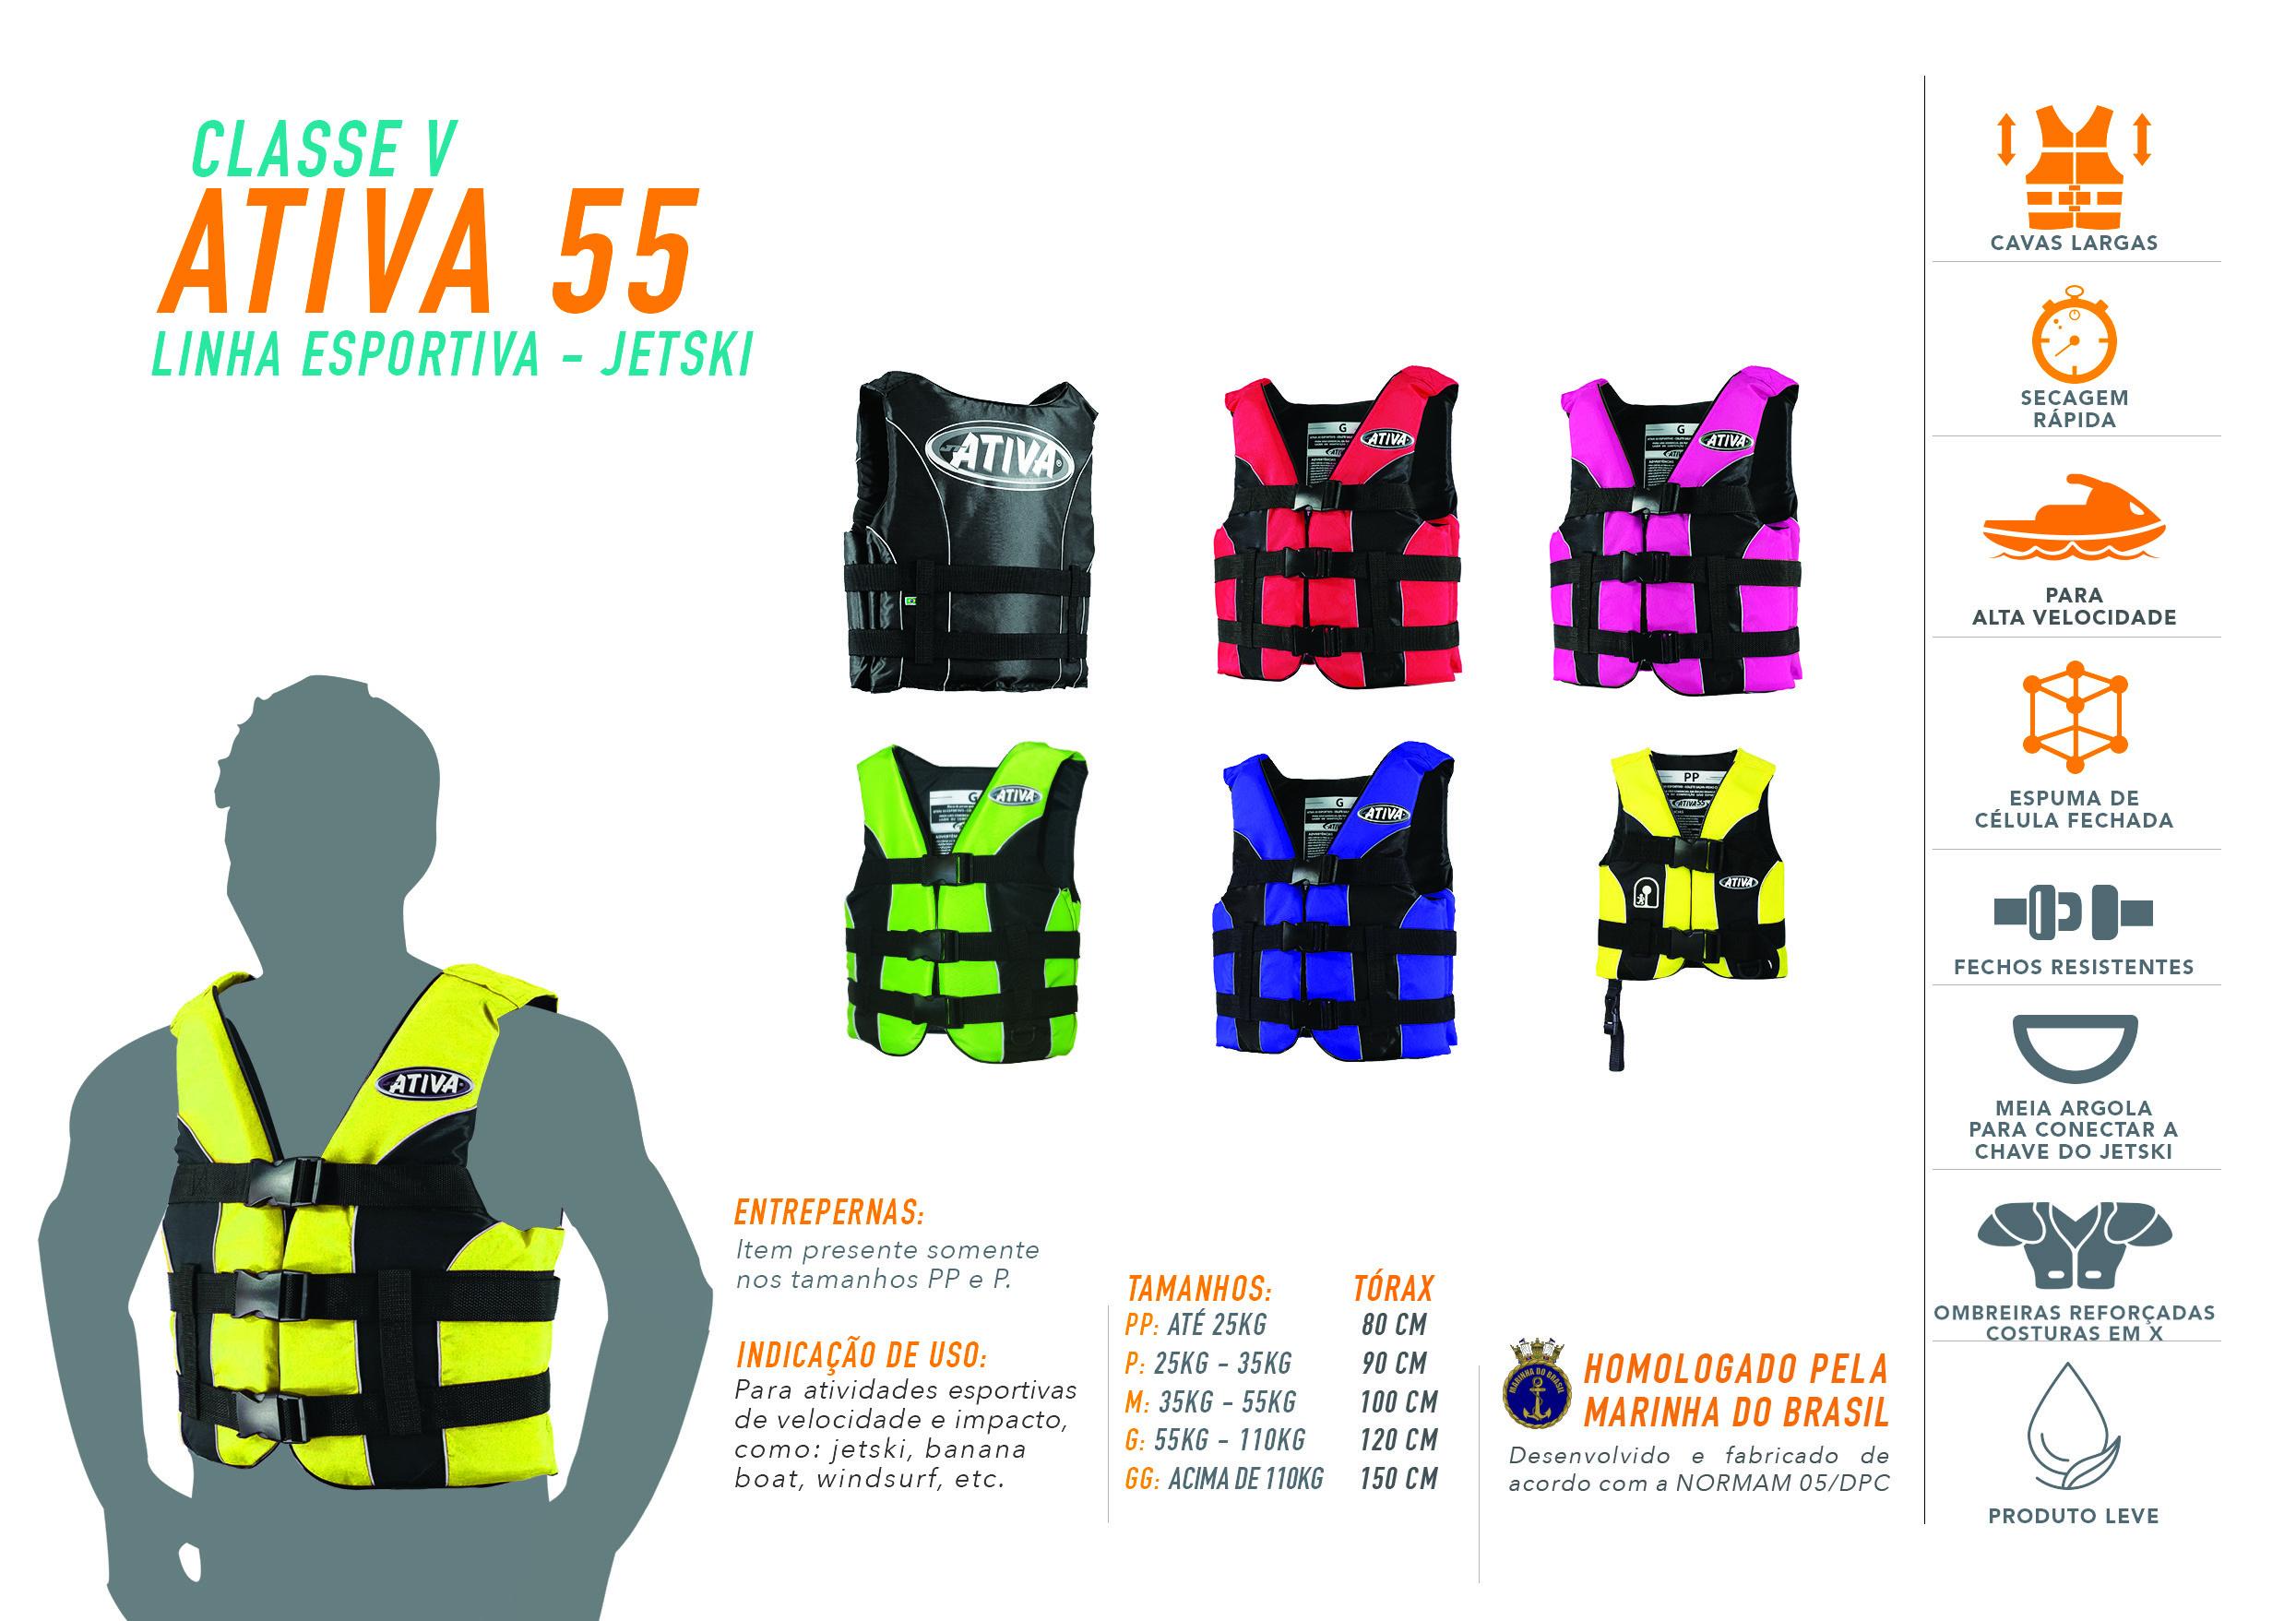 Ativa 55